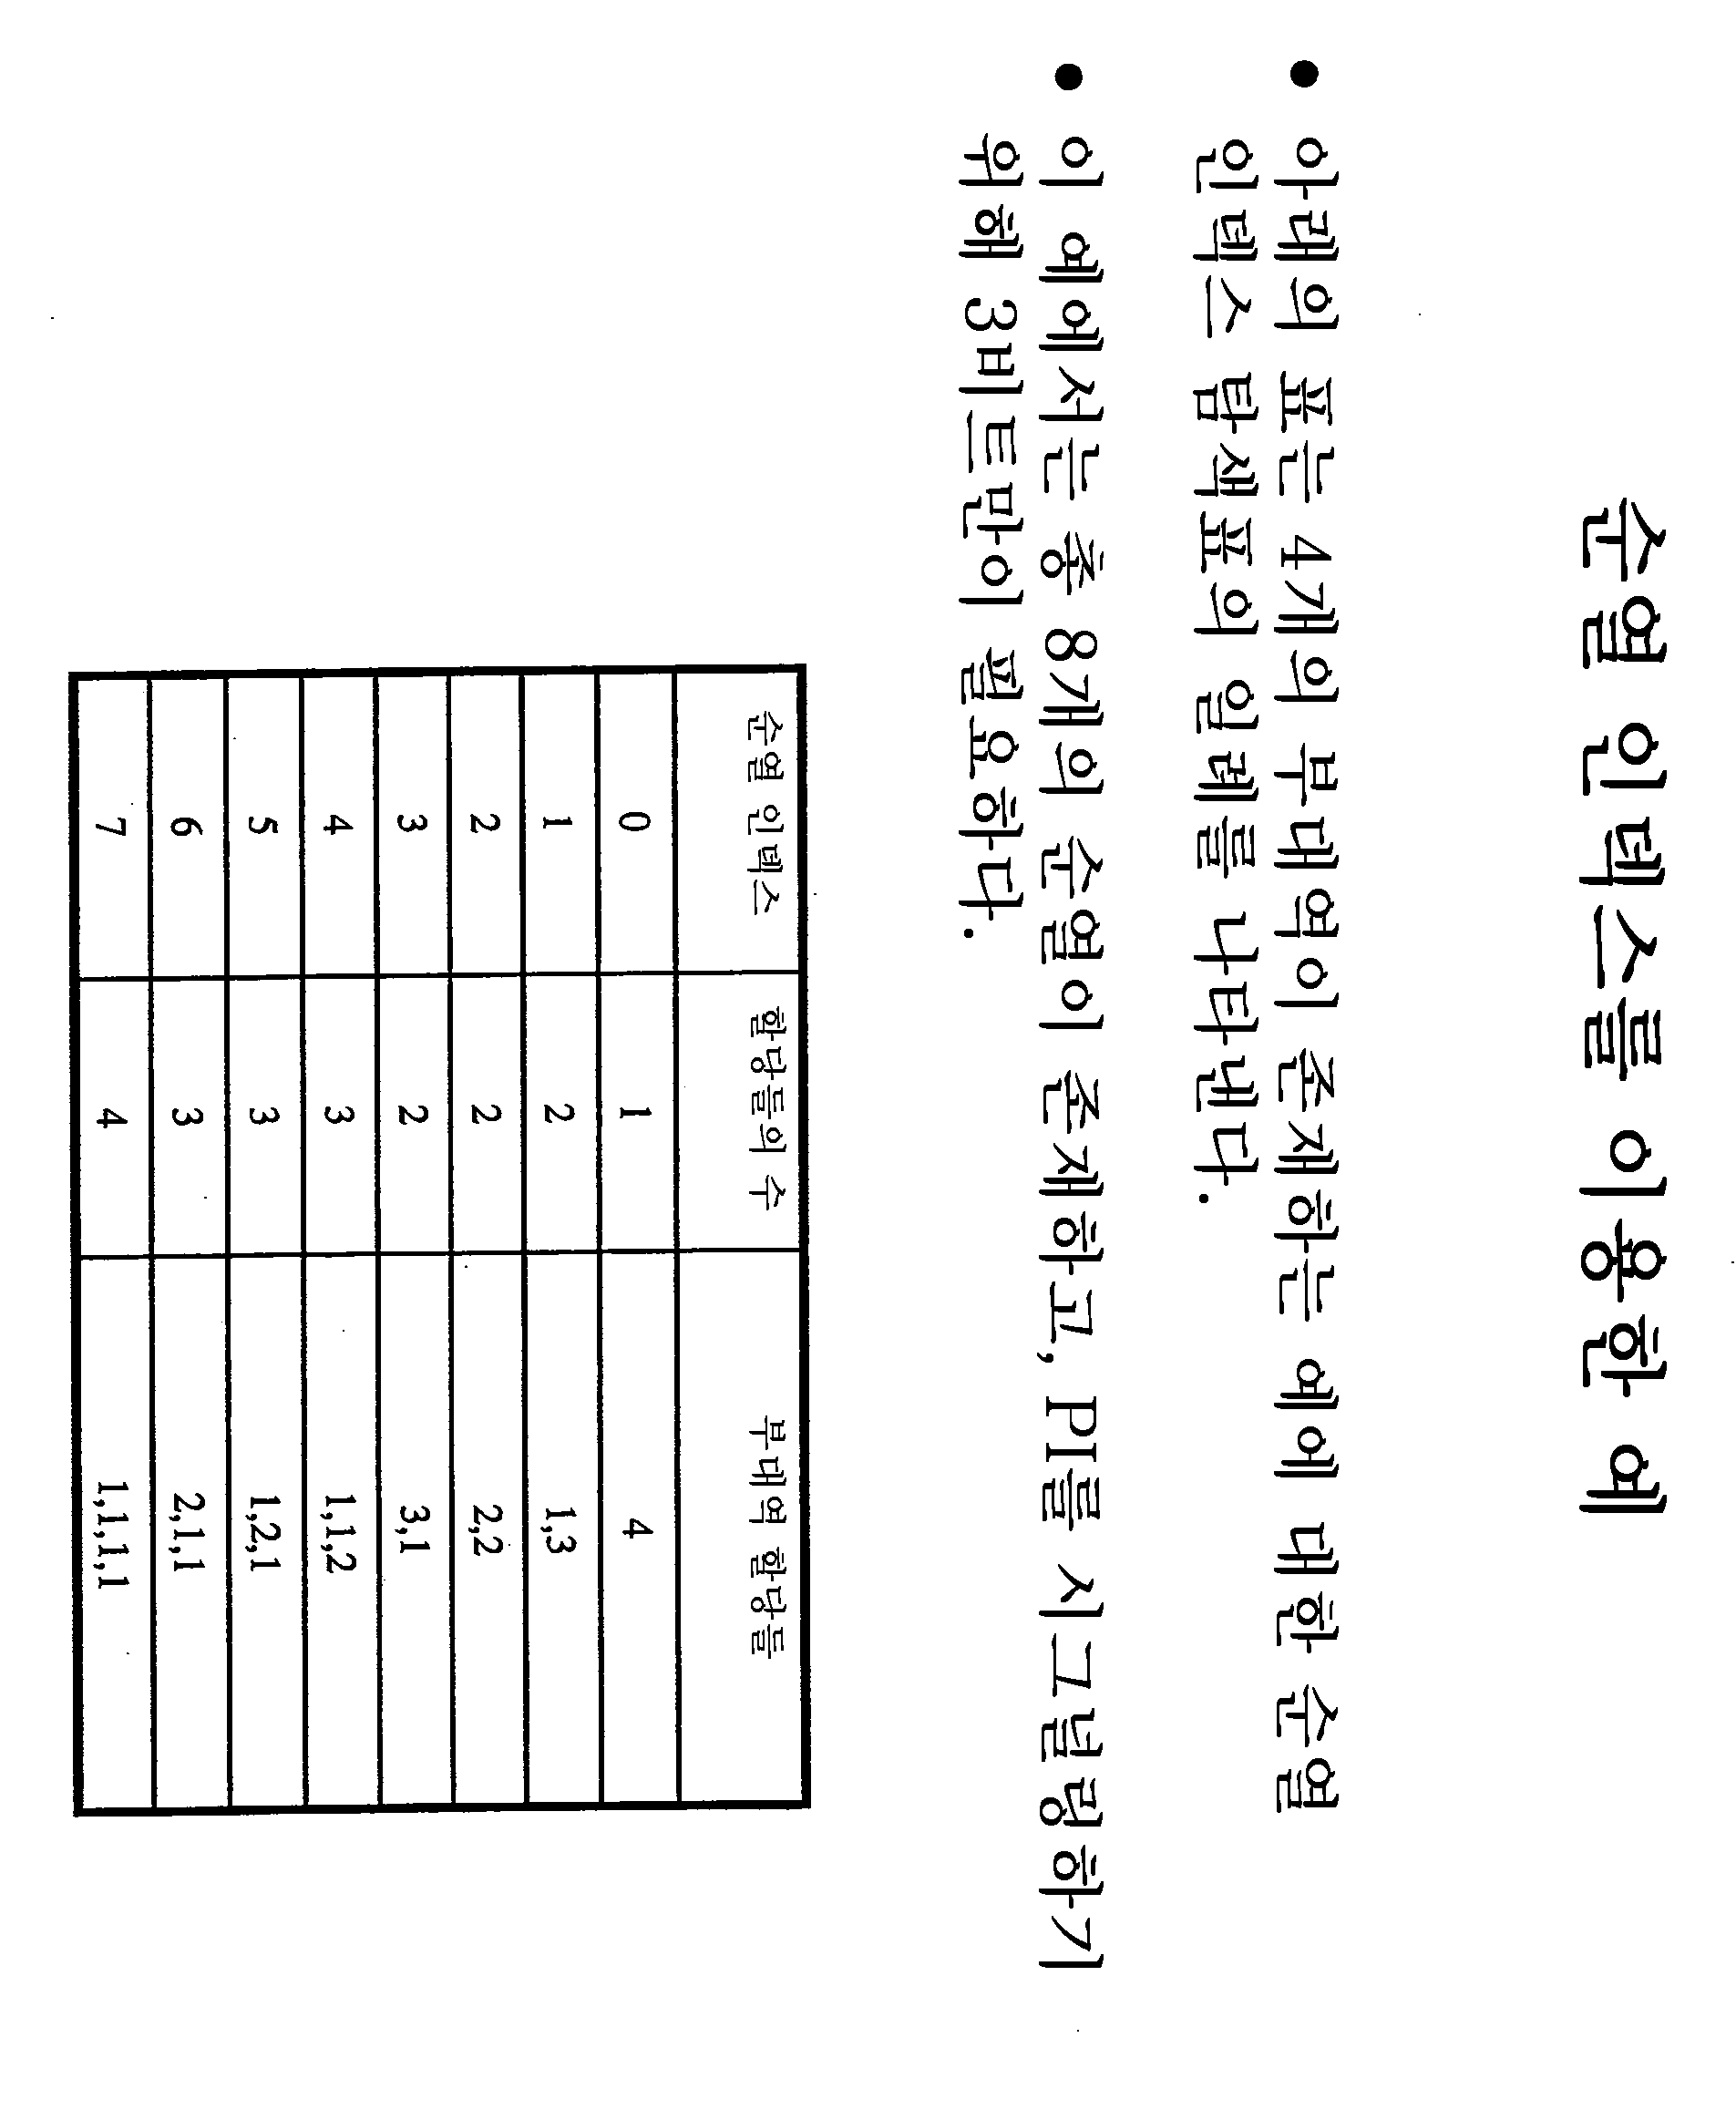 Figure 112014031700415-pat00034